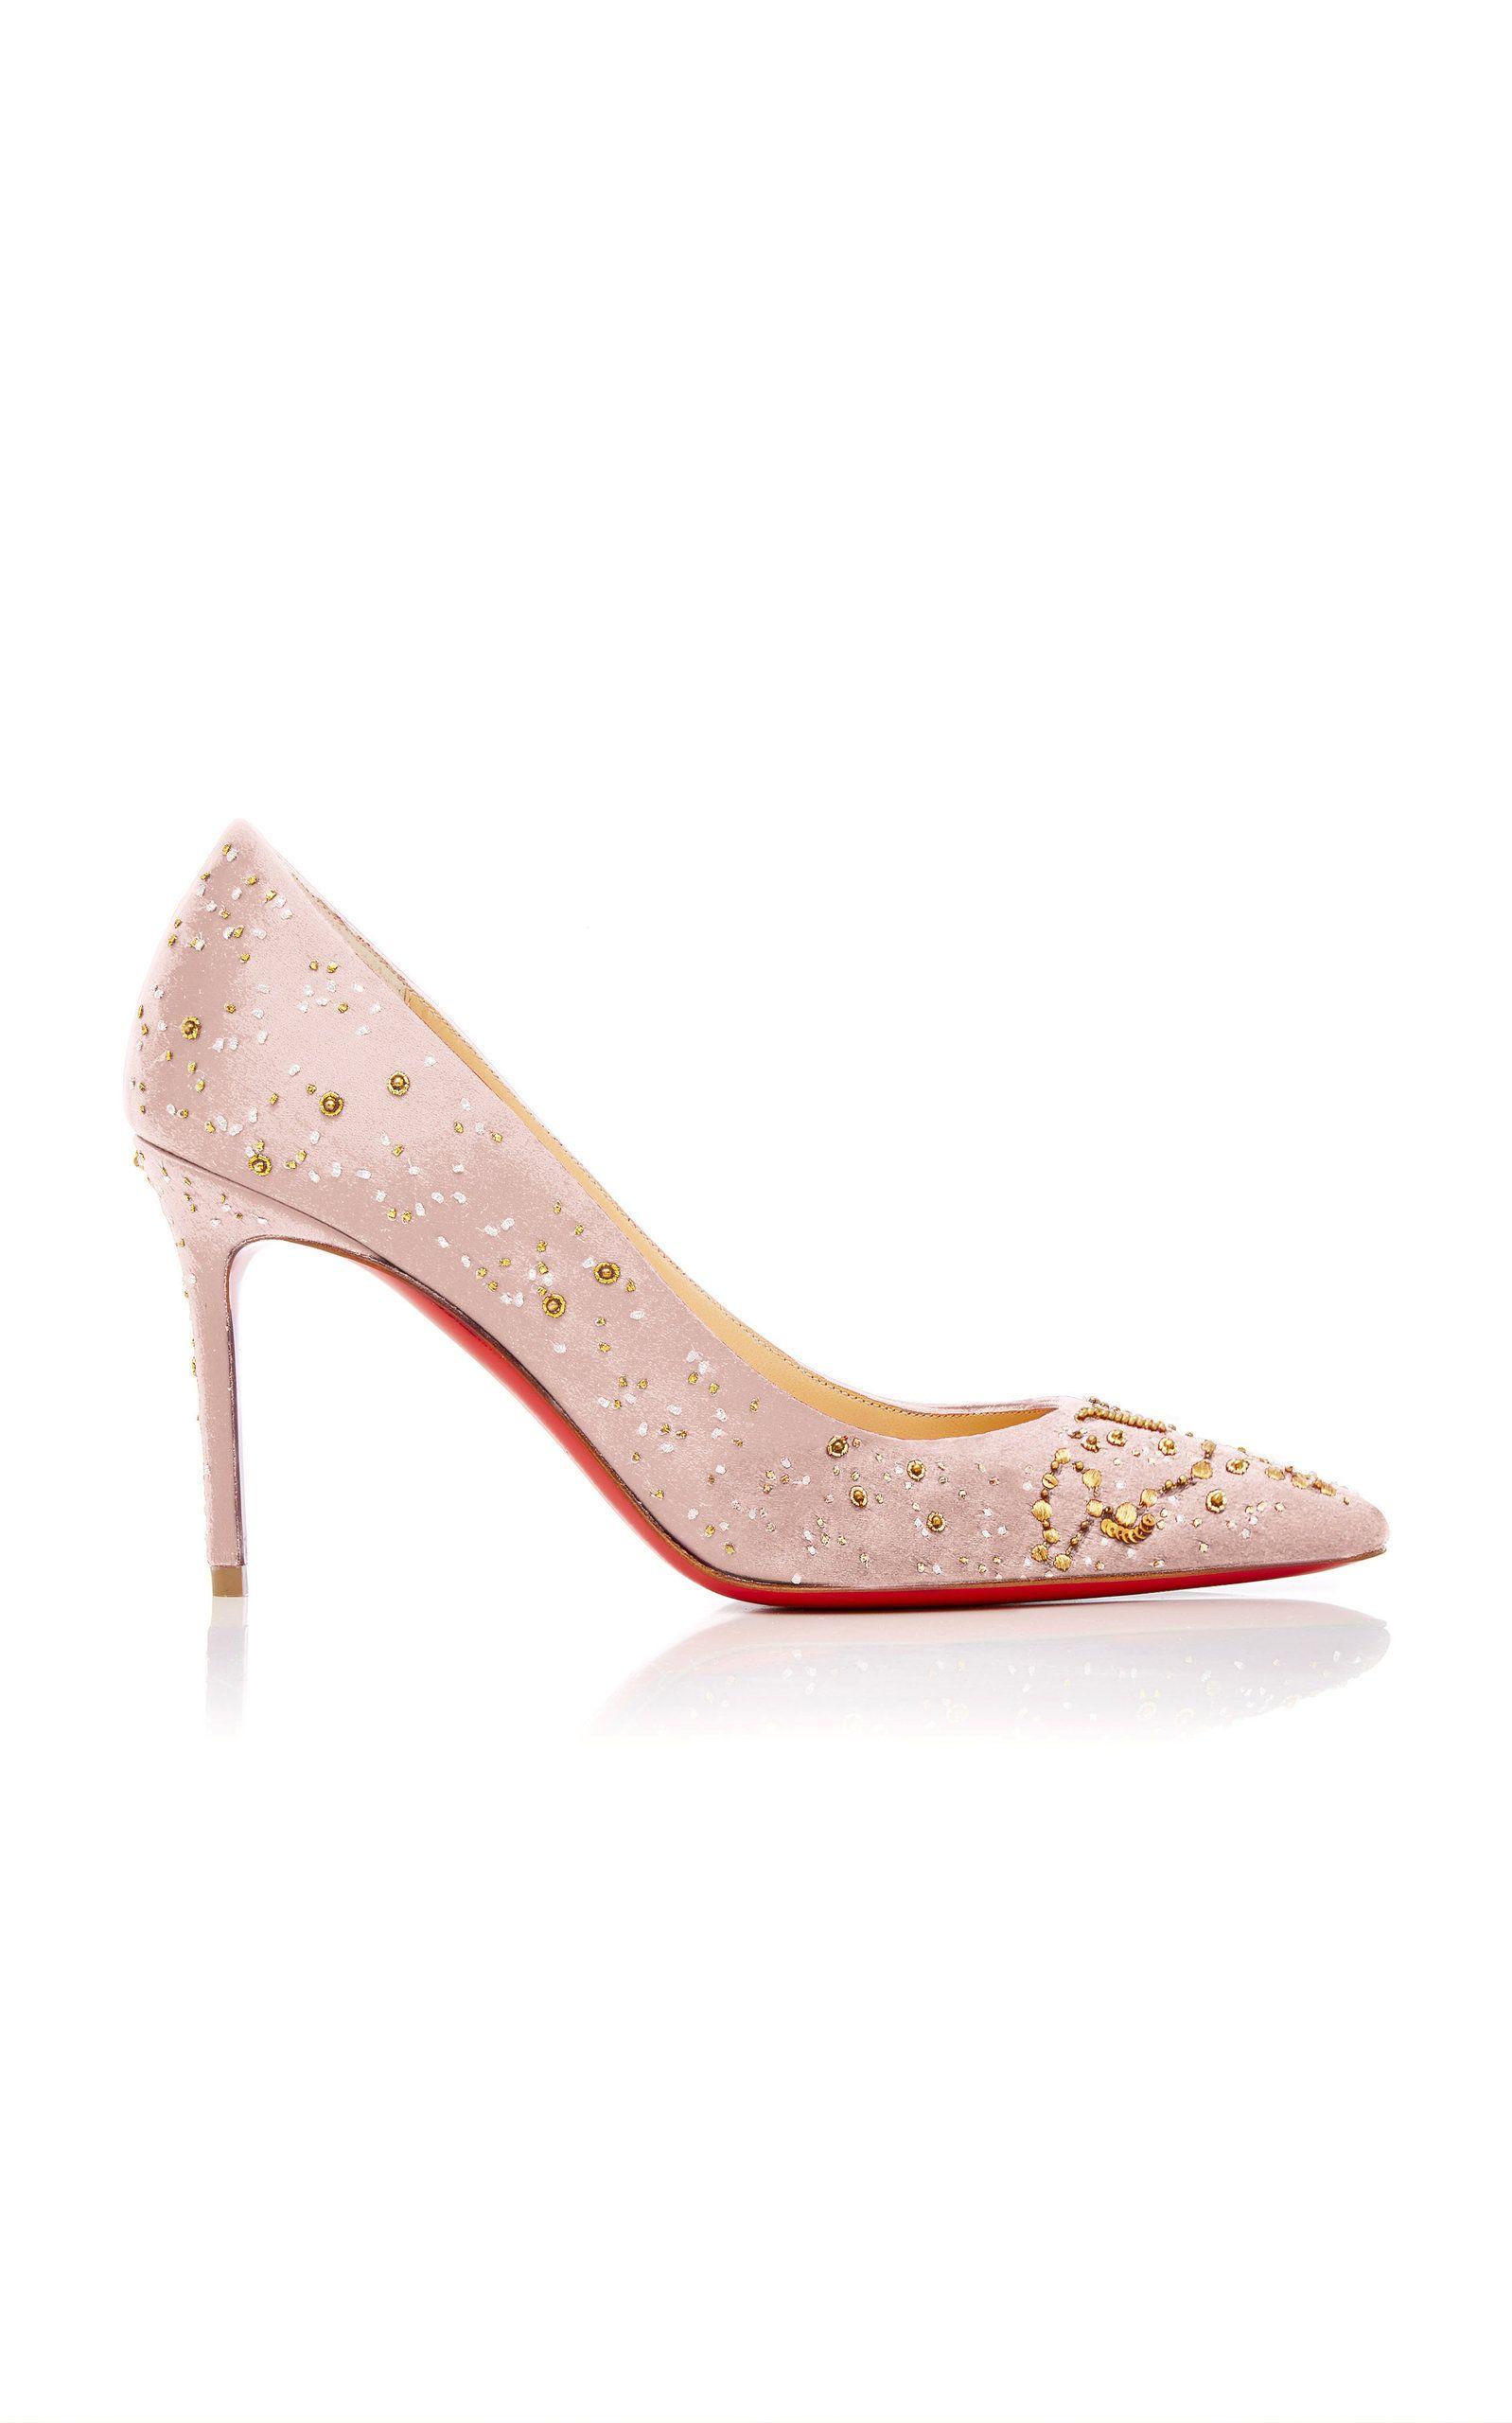 fcf1f82a869 CHRISTIAN LOUBOUTIN M O EXCLUSIVE  SAGITTARIUS ZODIAC PUMP.   christianlouboutin  shoes